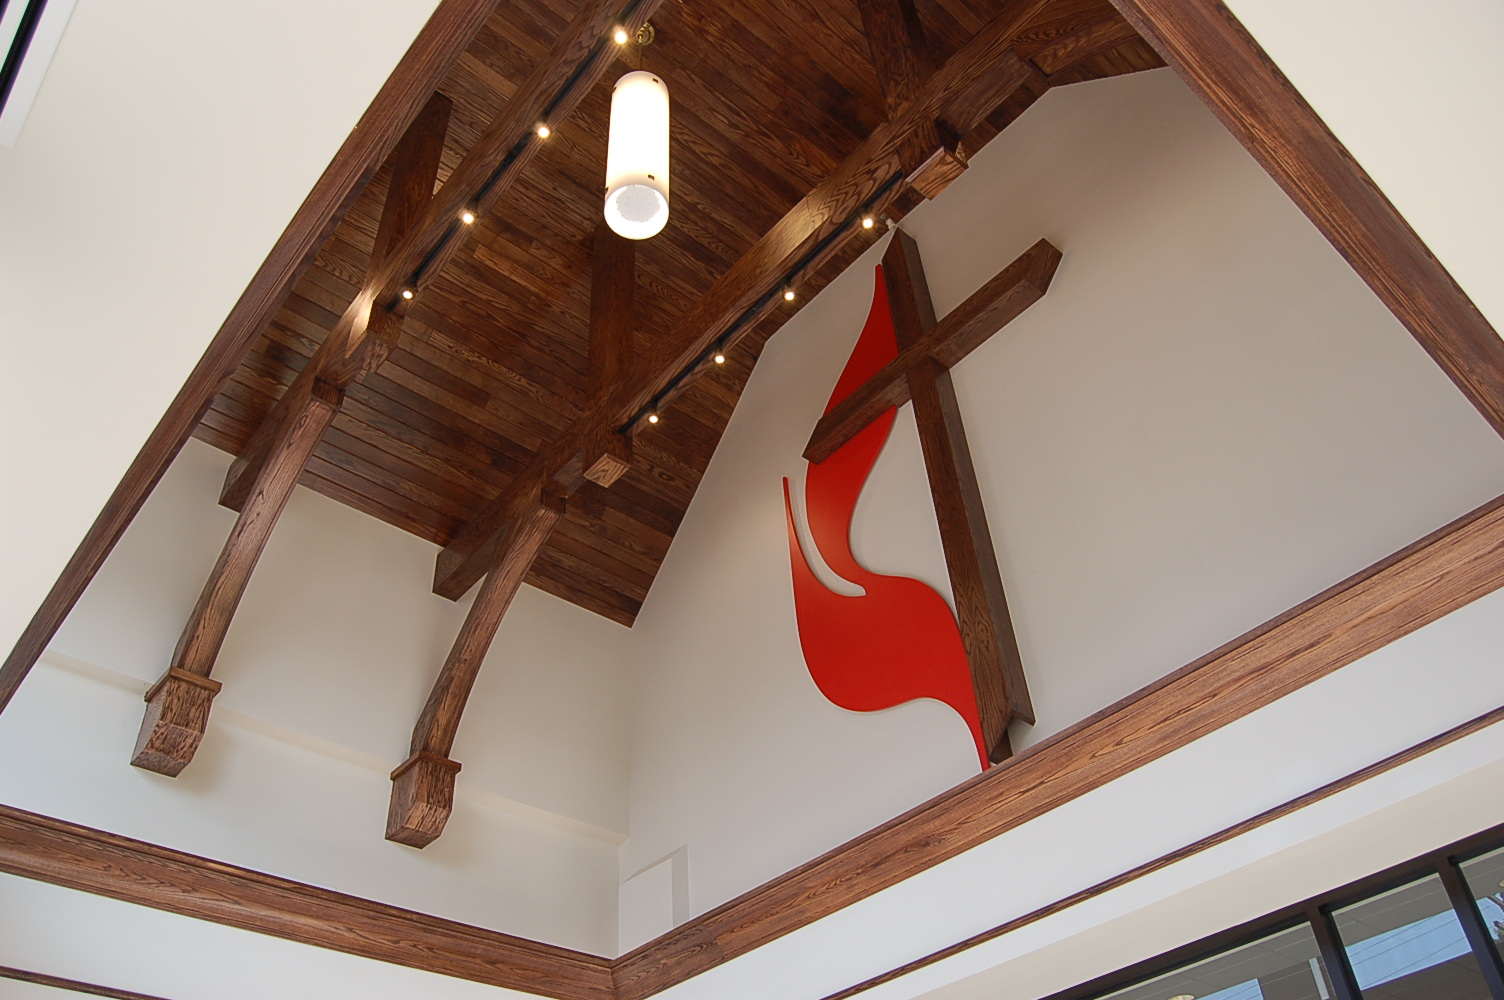 Methodist Cross and Flame